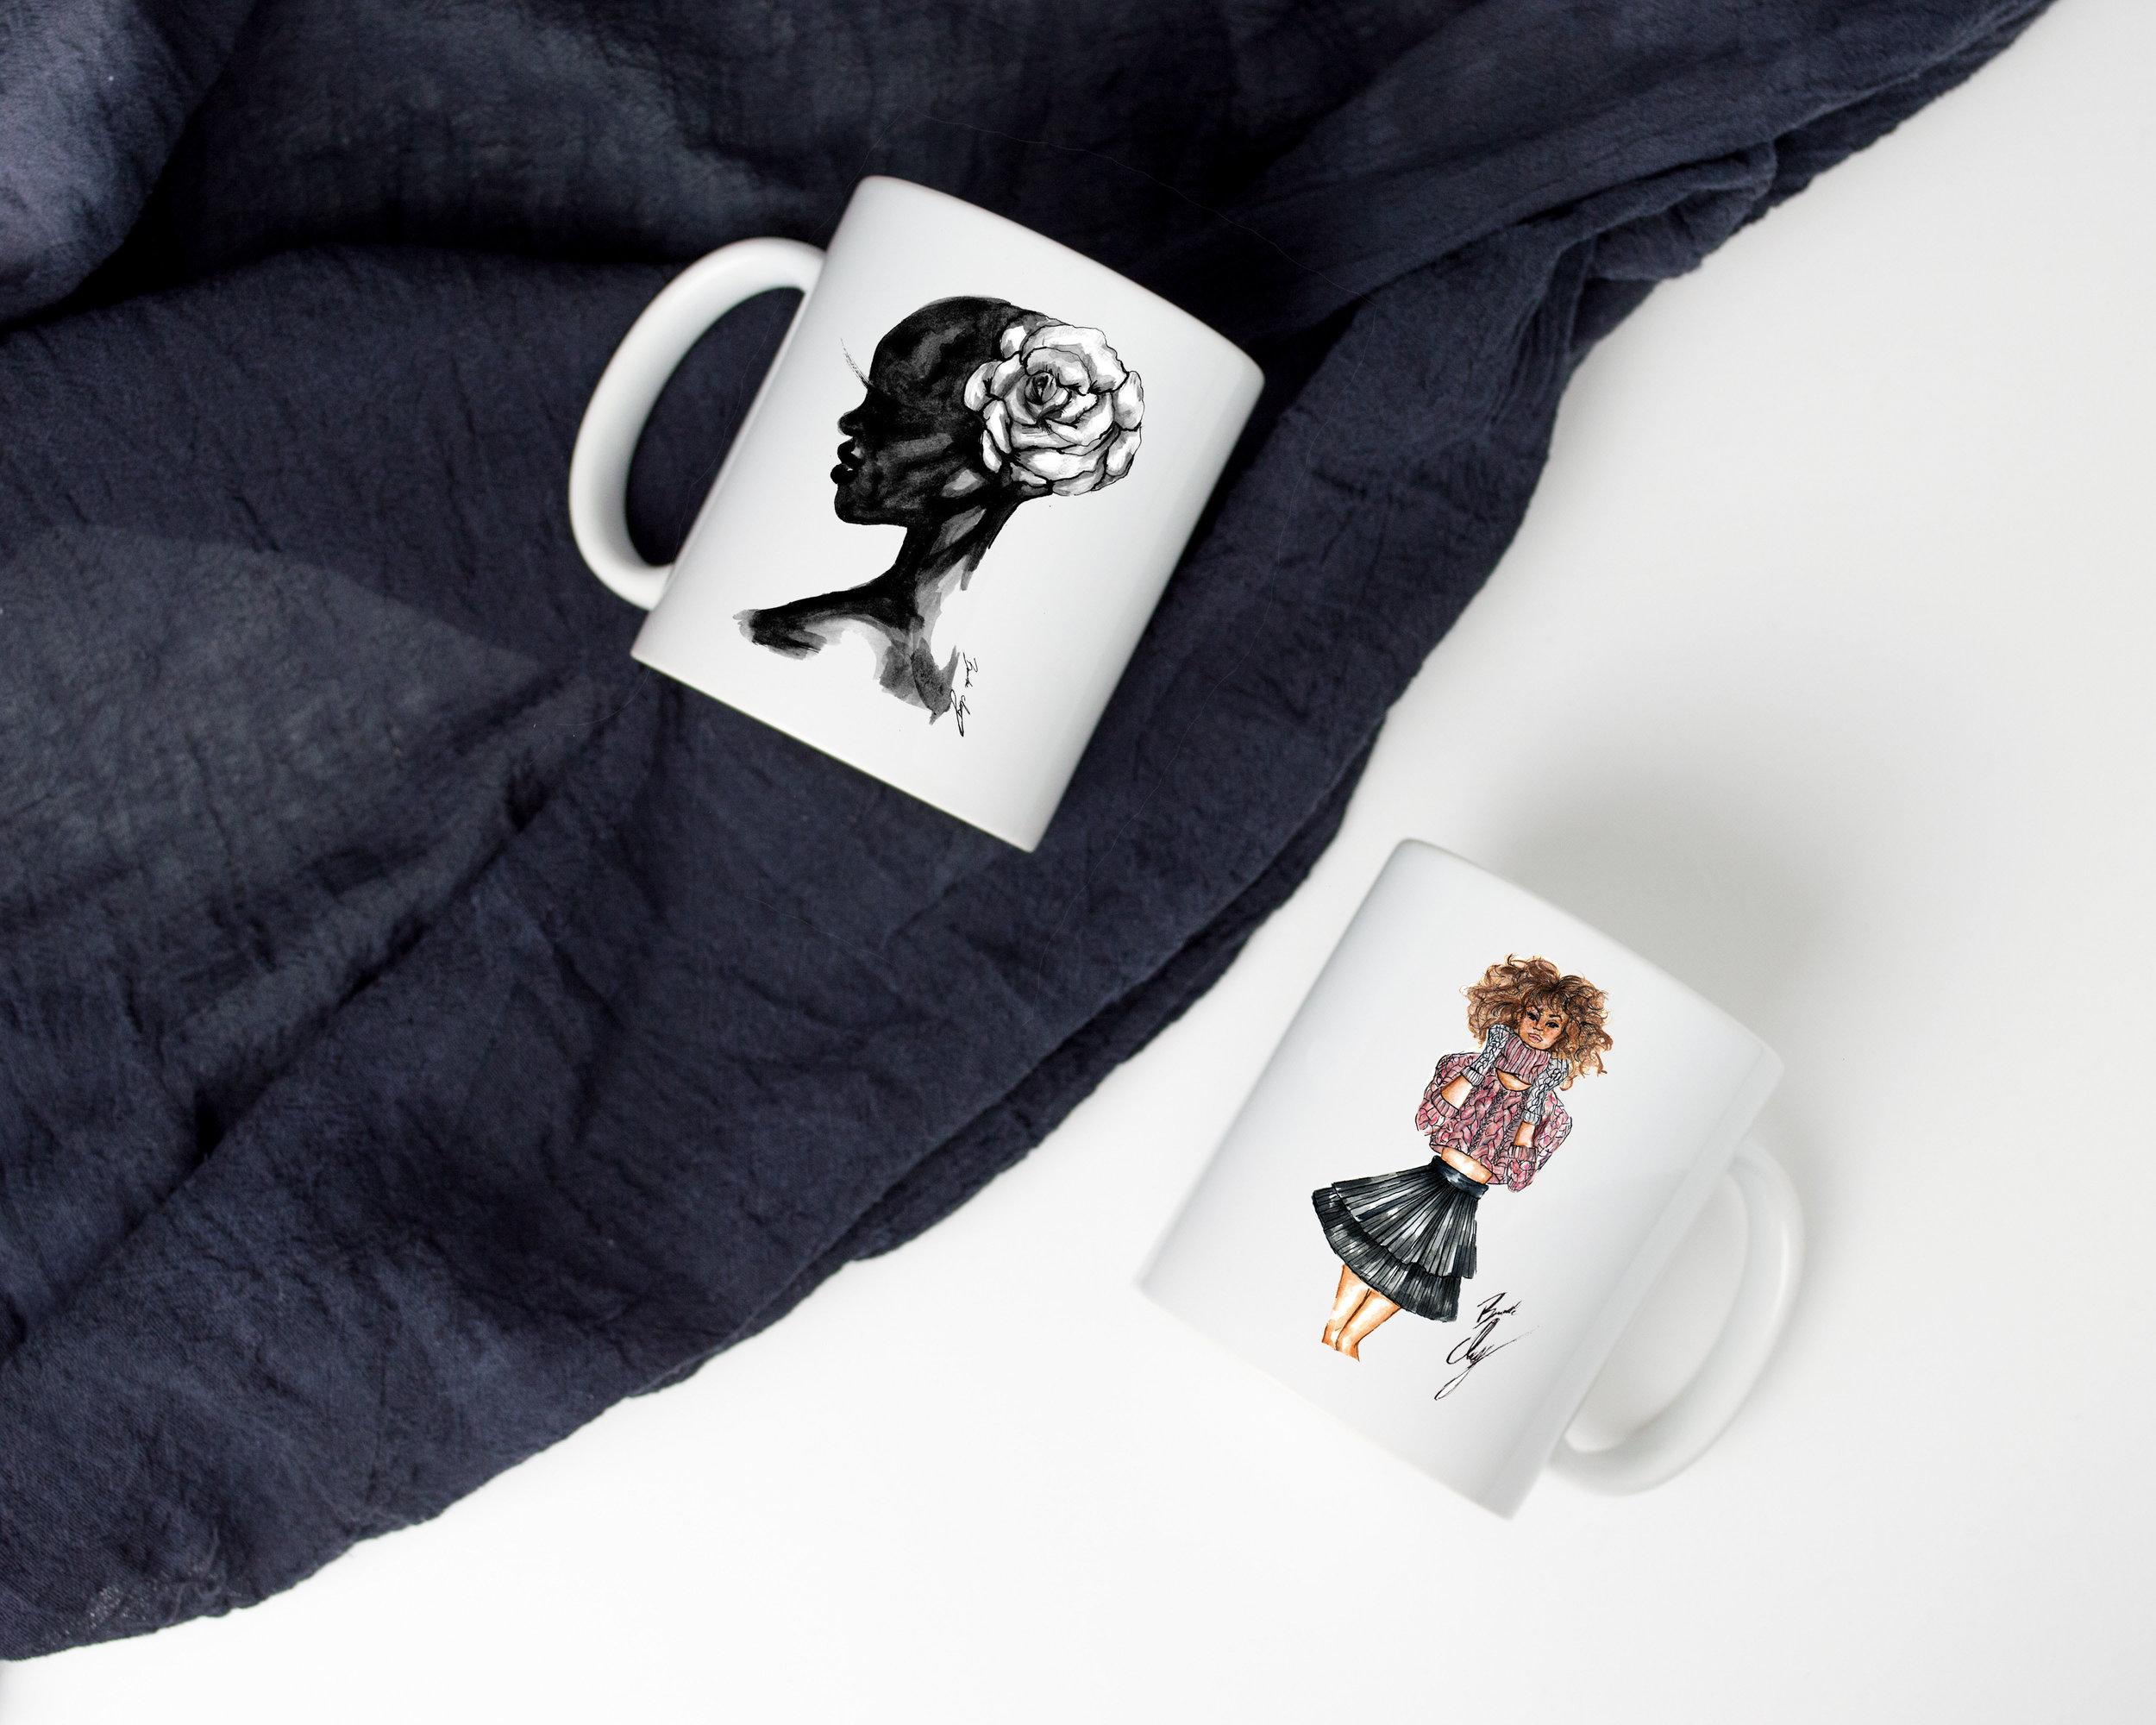 Coffee Mugs - Shop Chic Coffee Mugs and Travel Tumblers